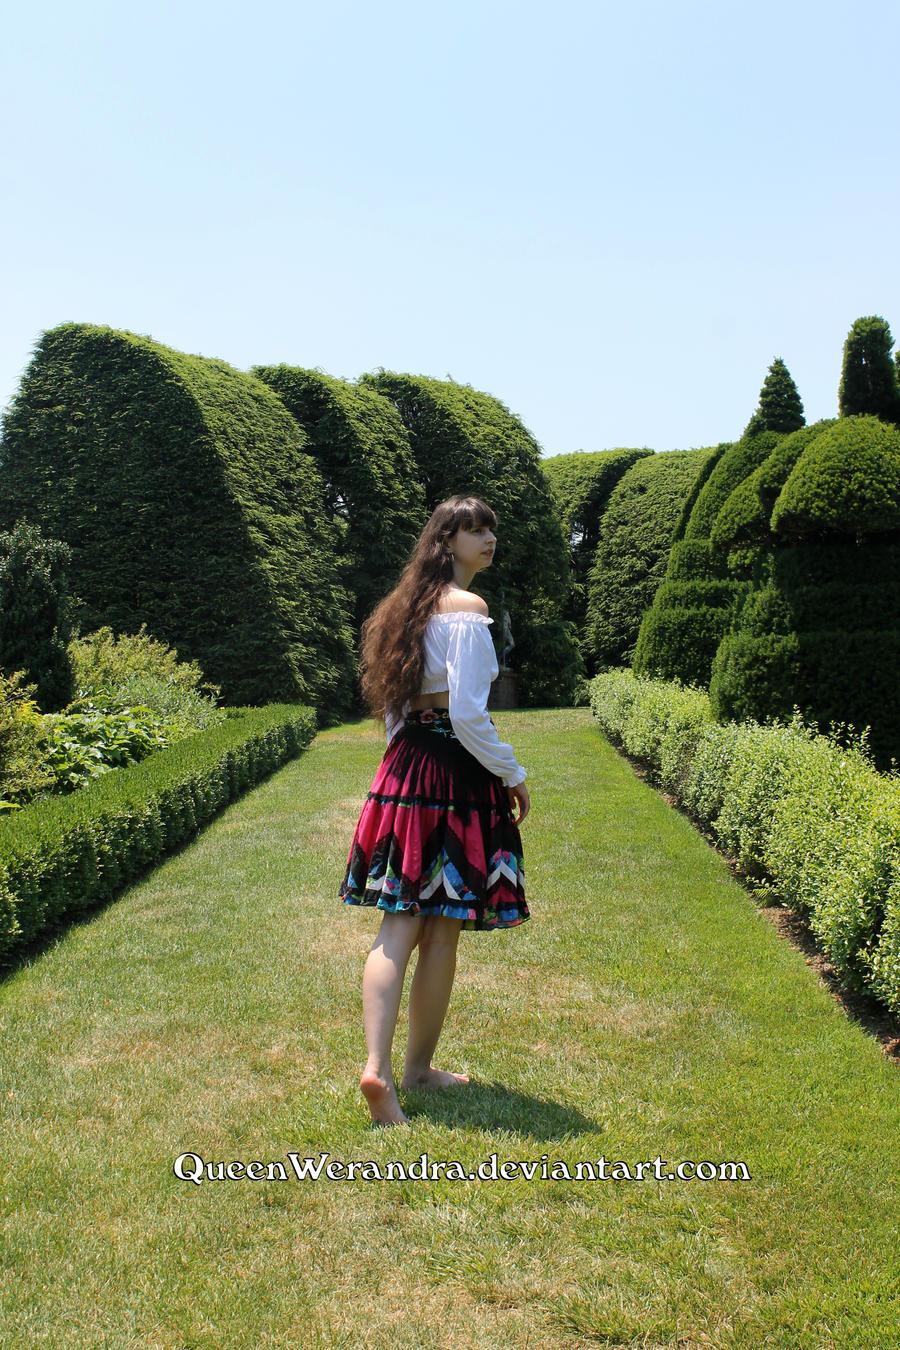 http://img02.deviantart.net/6e75/i/2017/192/b/9/lost_in_the_gardens_of_wonderland_iii_by_queenwerandra-dbfz3hc.jpg